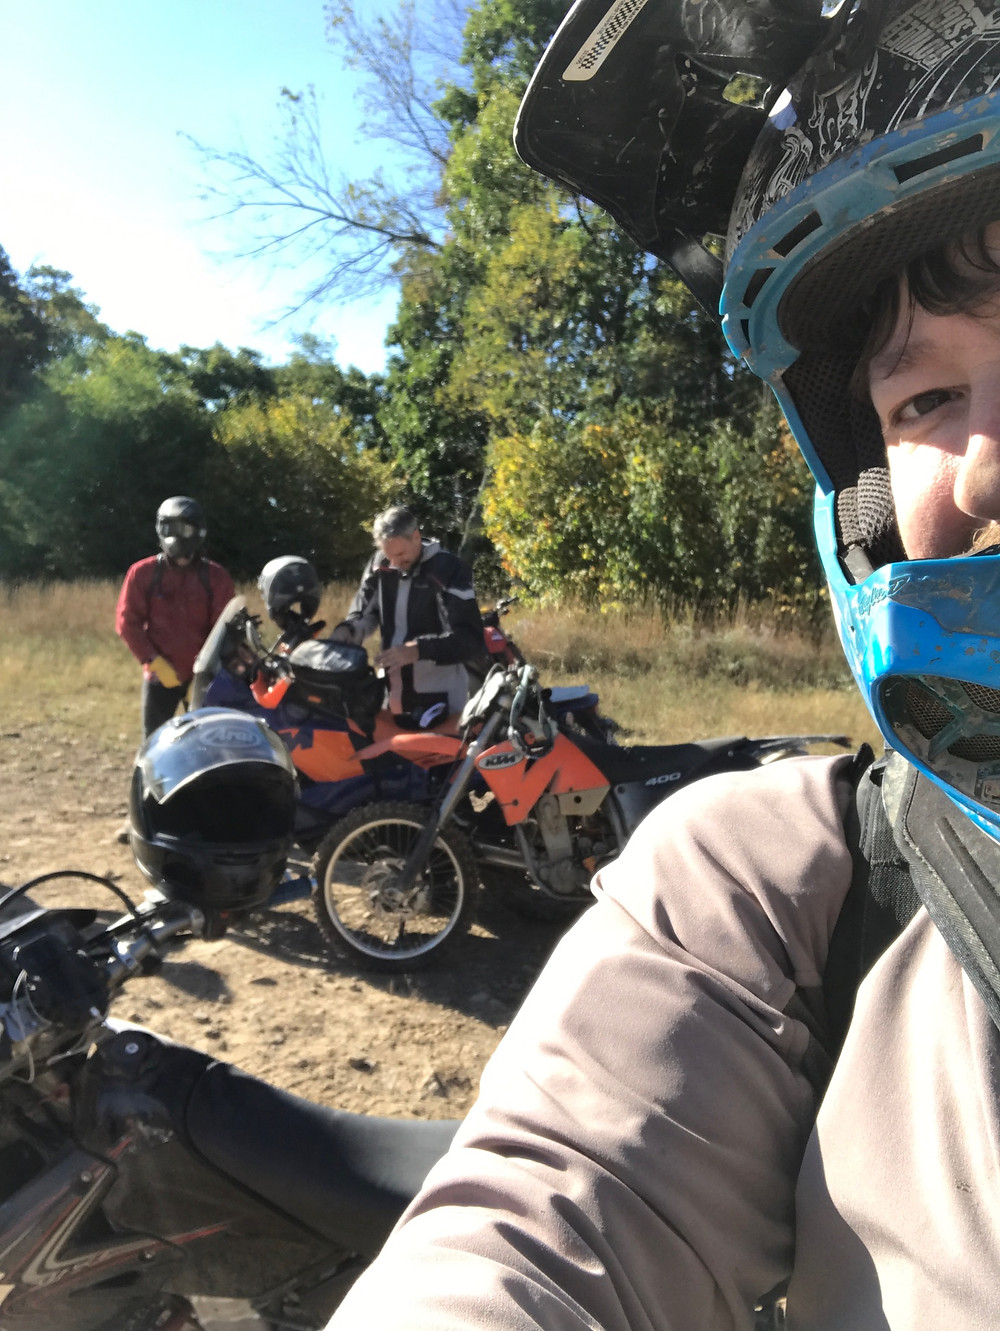 KTM, 990 Adventure, 400 EXC, Dirt bike, Motorcycle, Washington DC